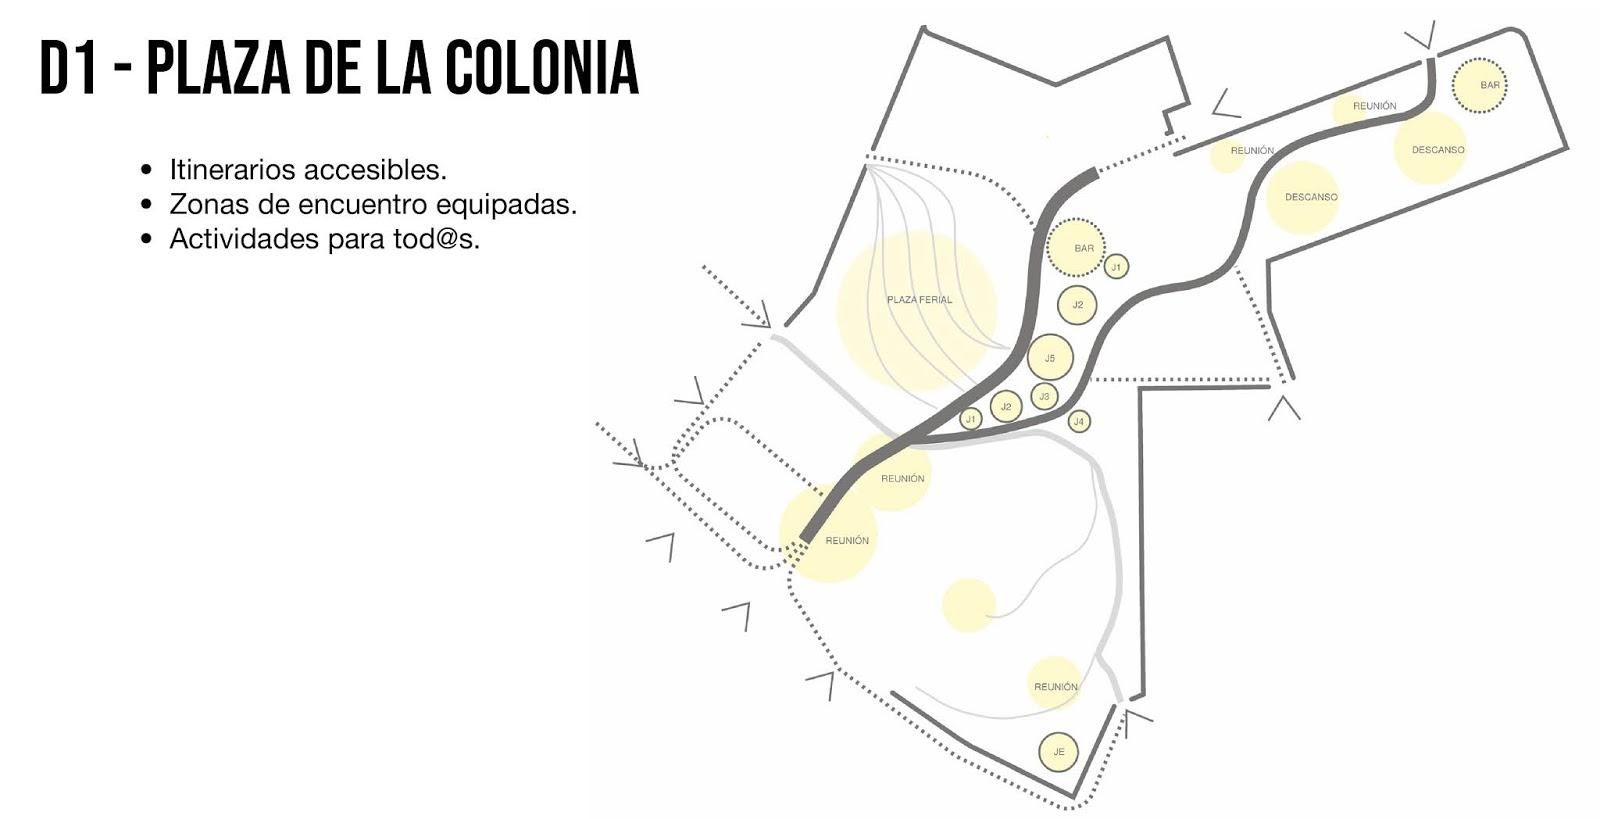 Imagina alcobendas colonias 2020